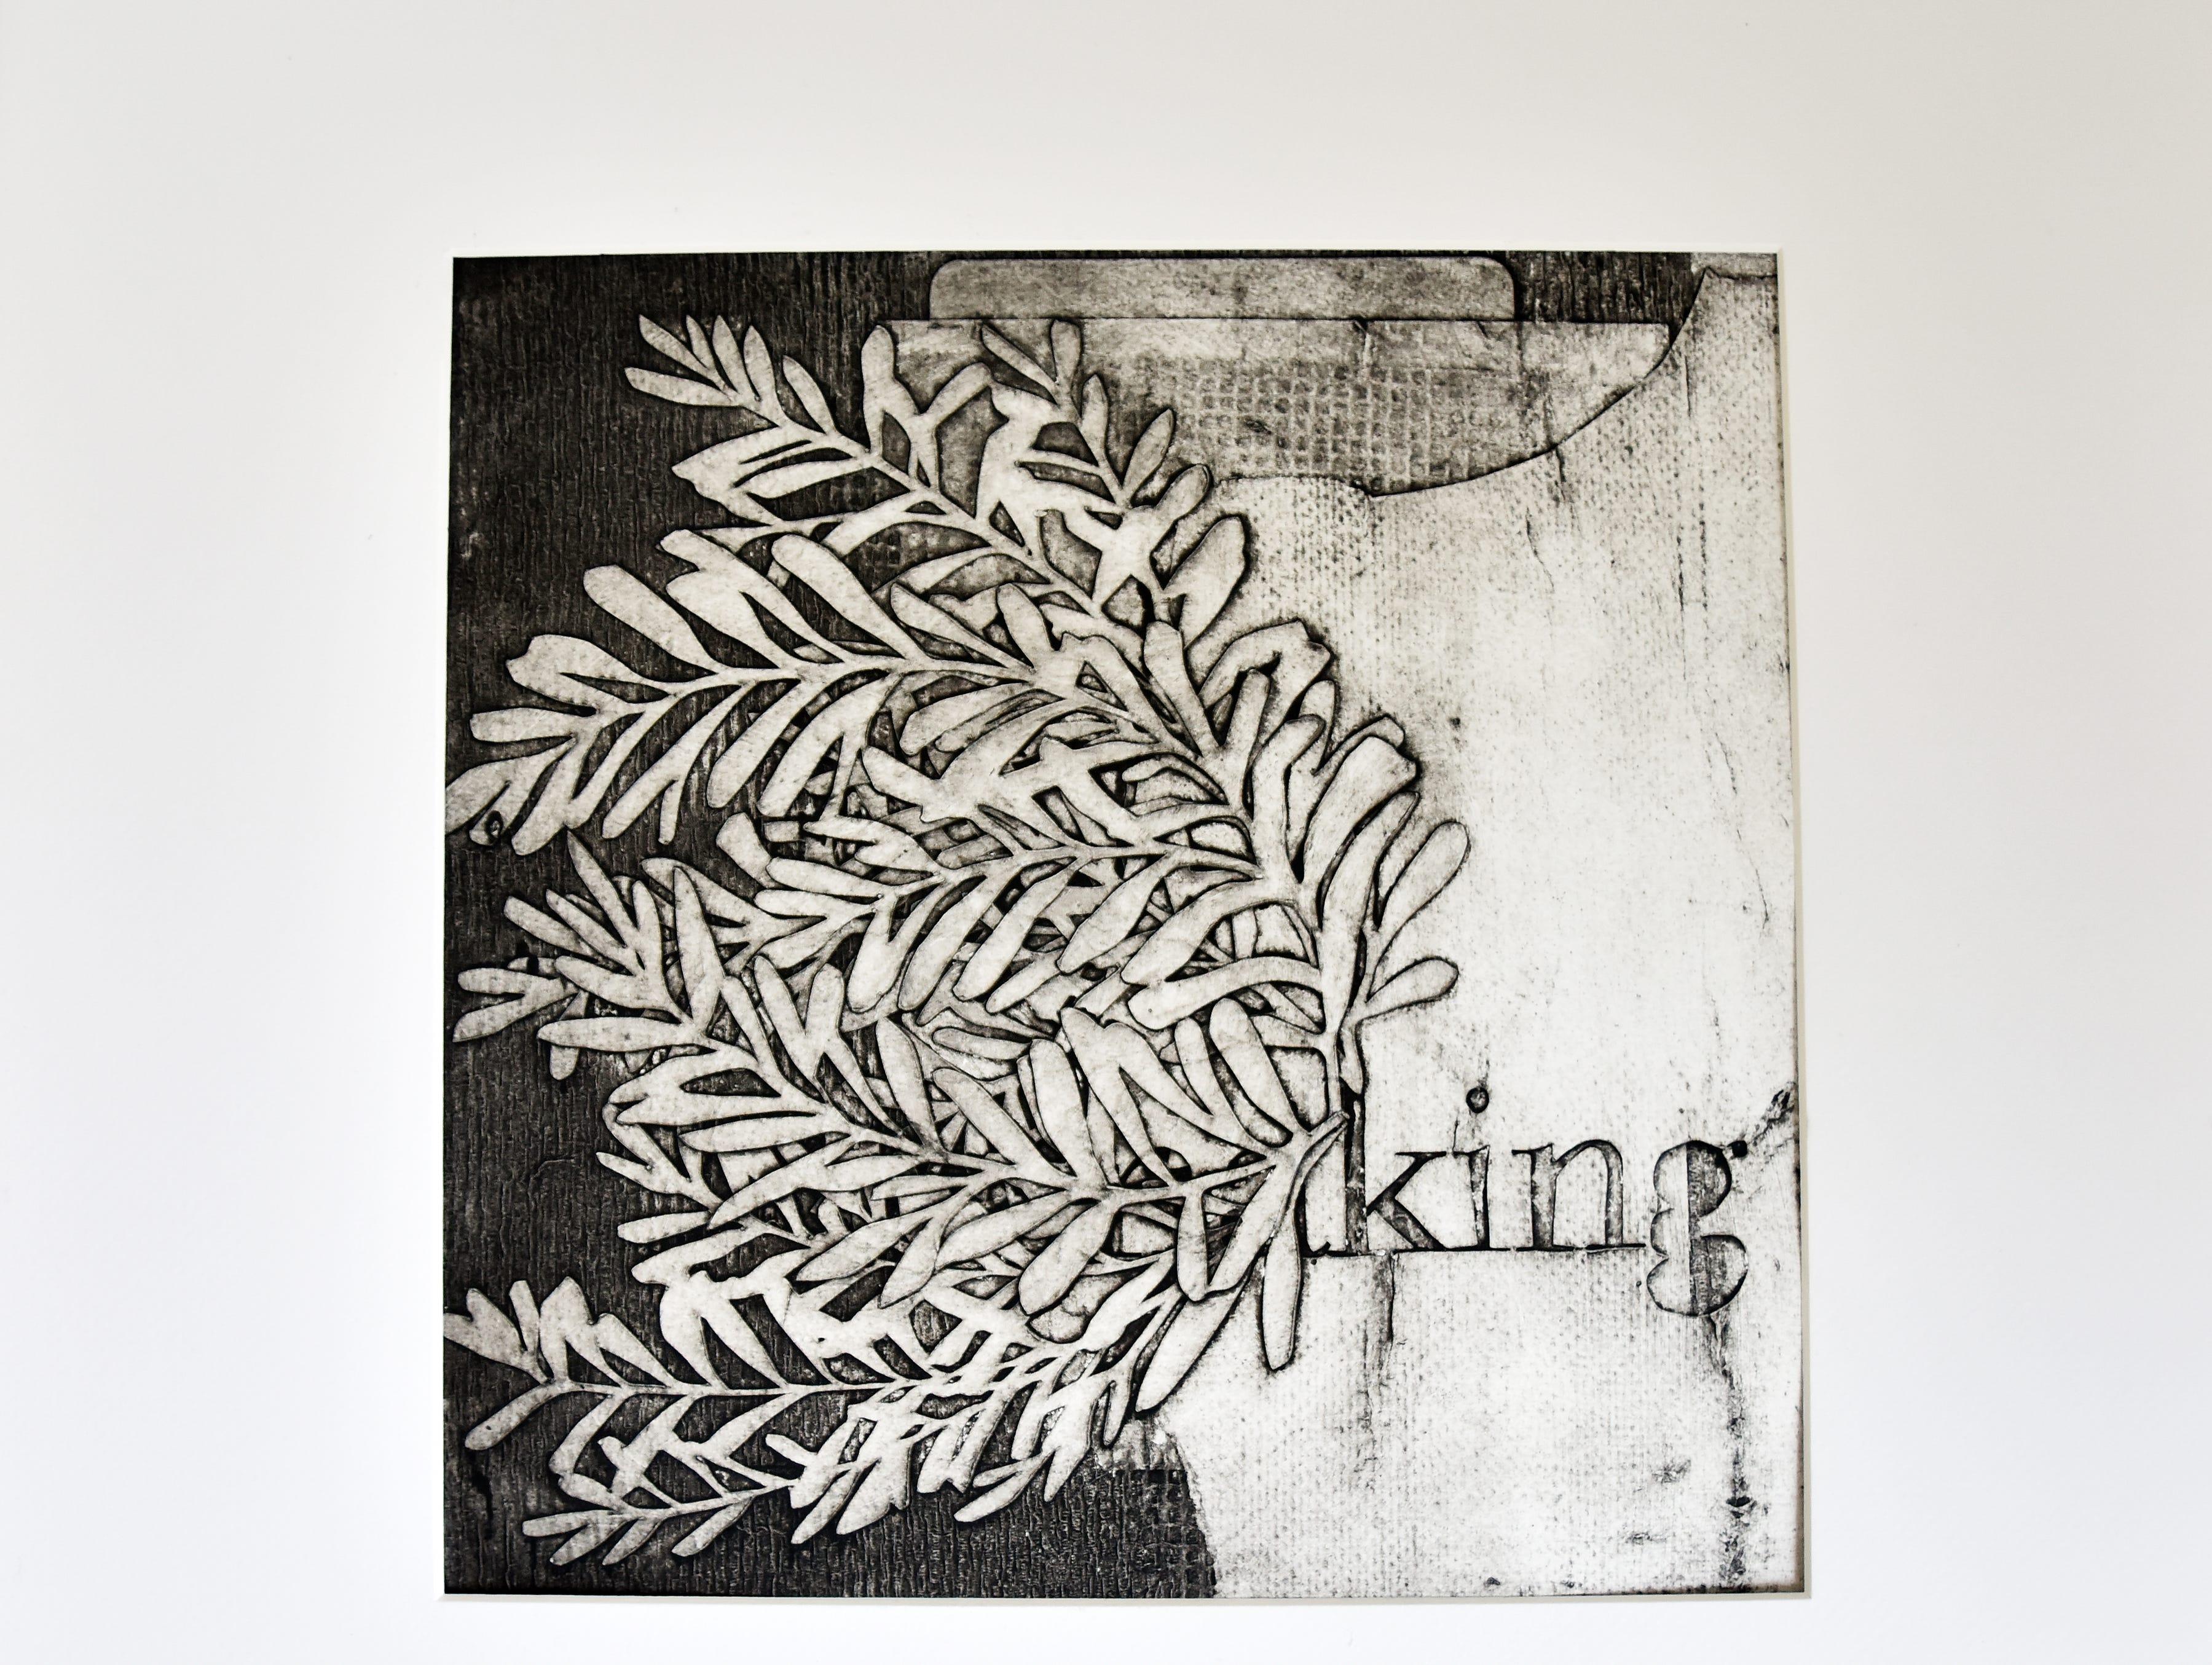 A print by artist Elizabeth Speaker.